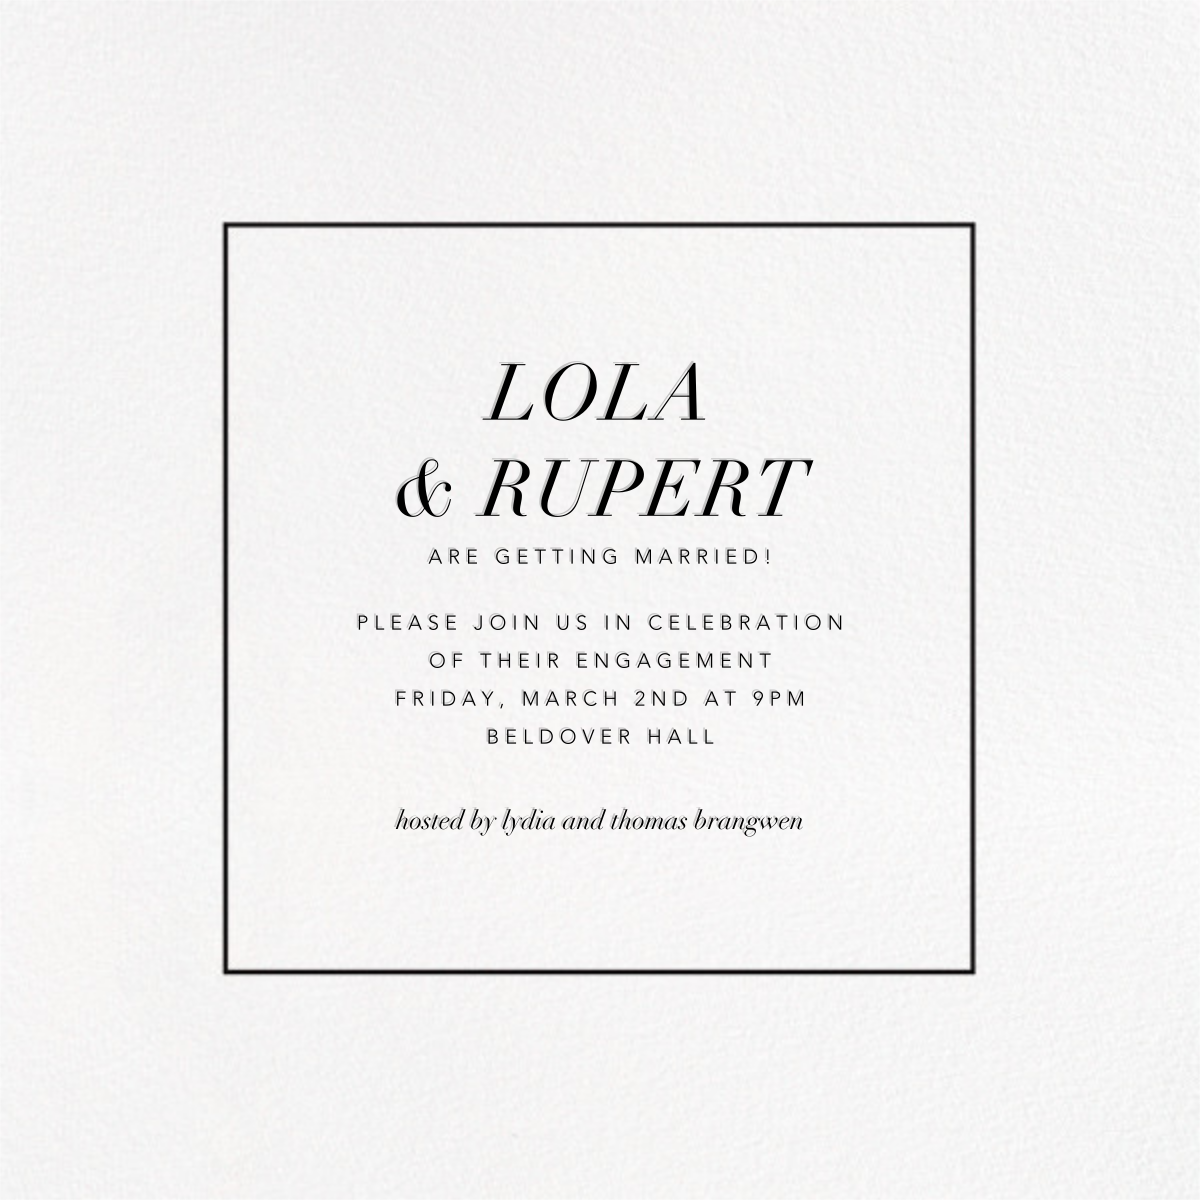 Konfetti (Photo) - Silver - Kelly Wearstler - Engagement party - card back